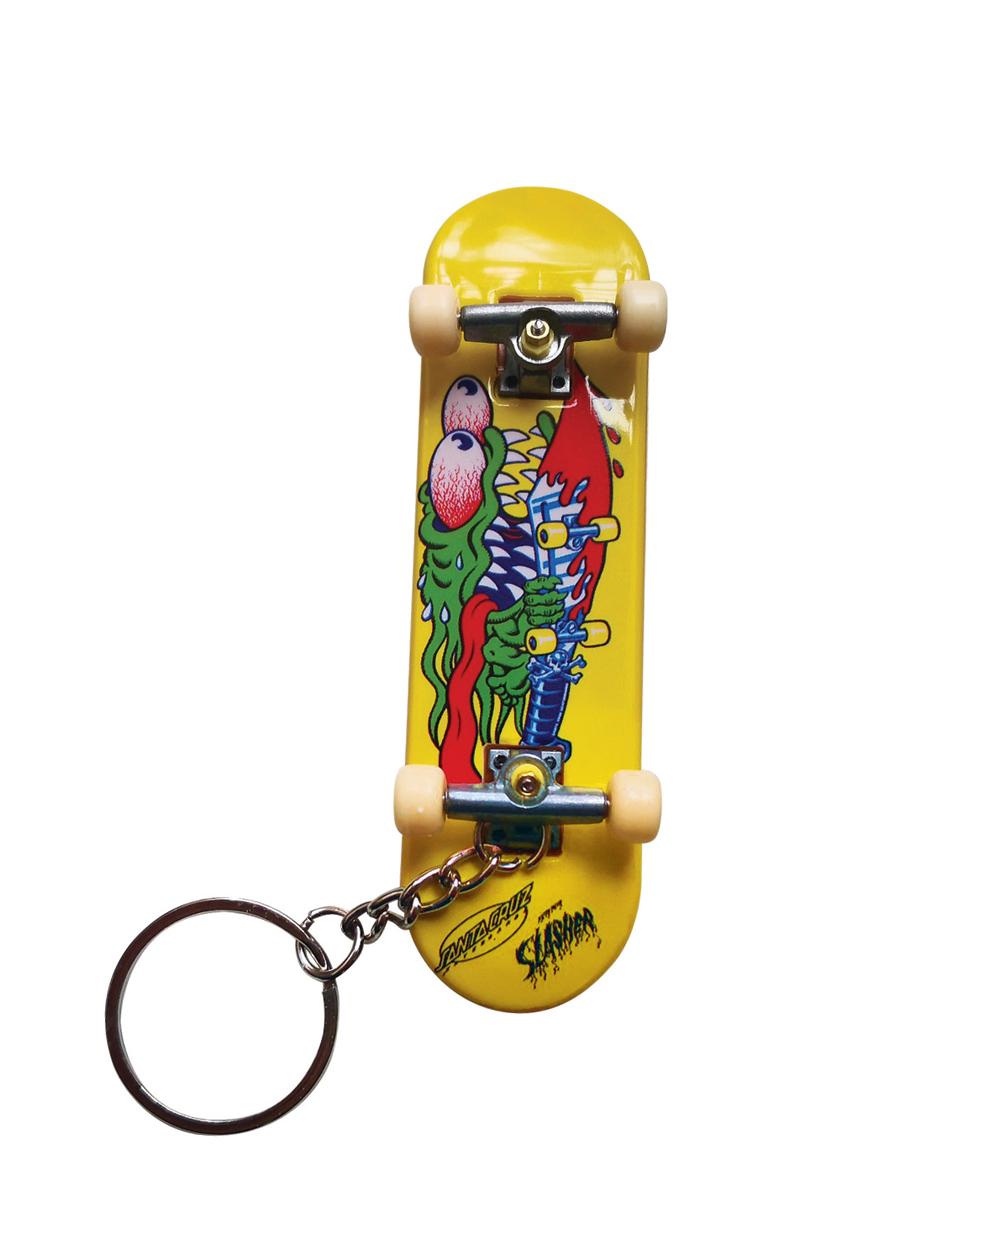 Santa Cruz Slasher Fingerboard Keychain Yellow